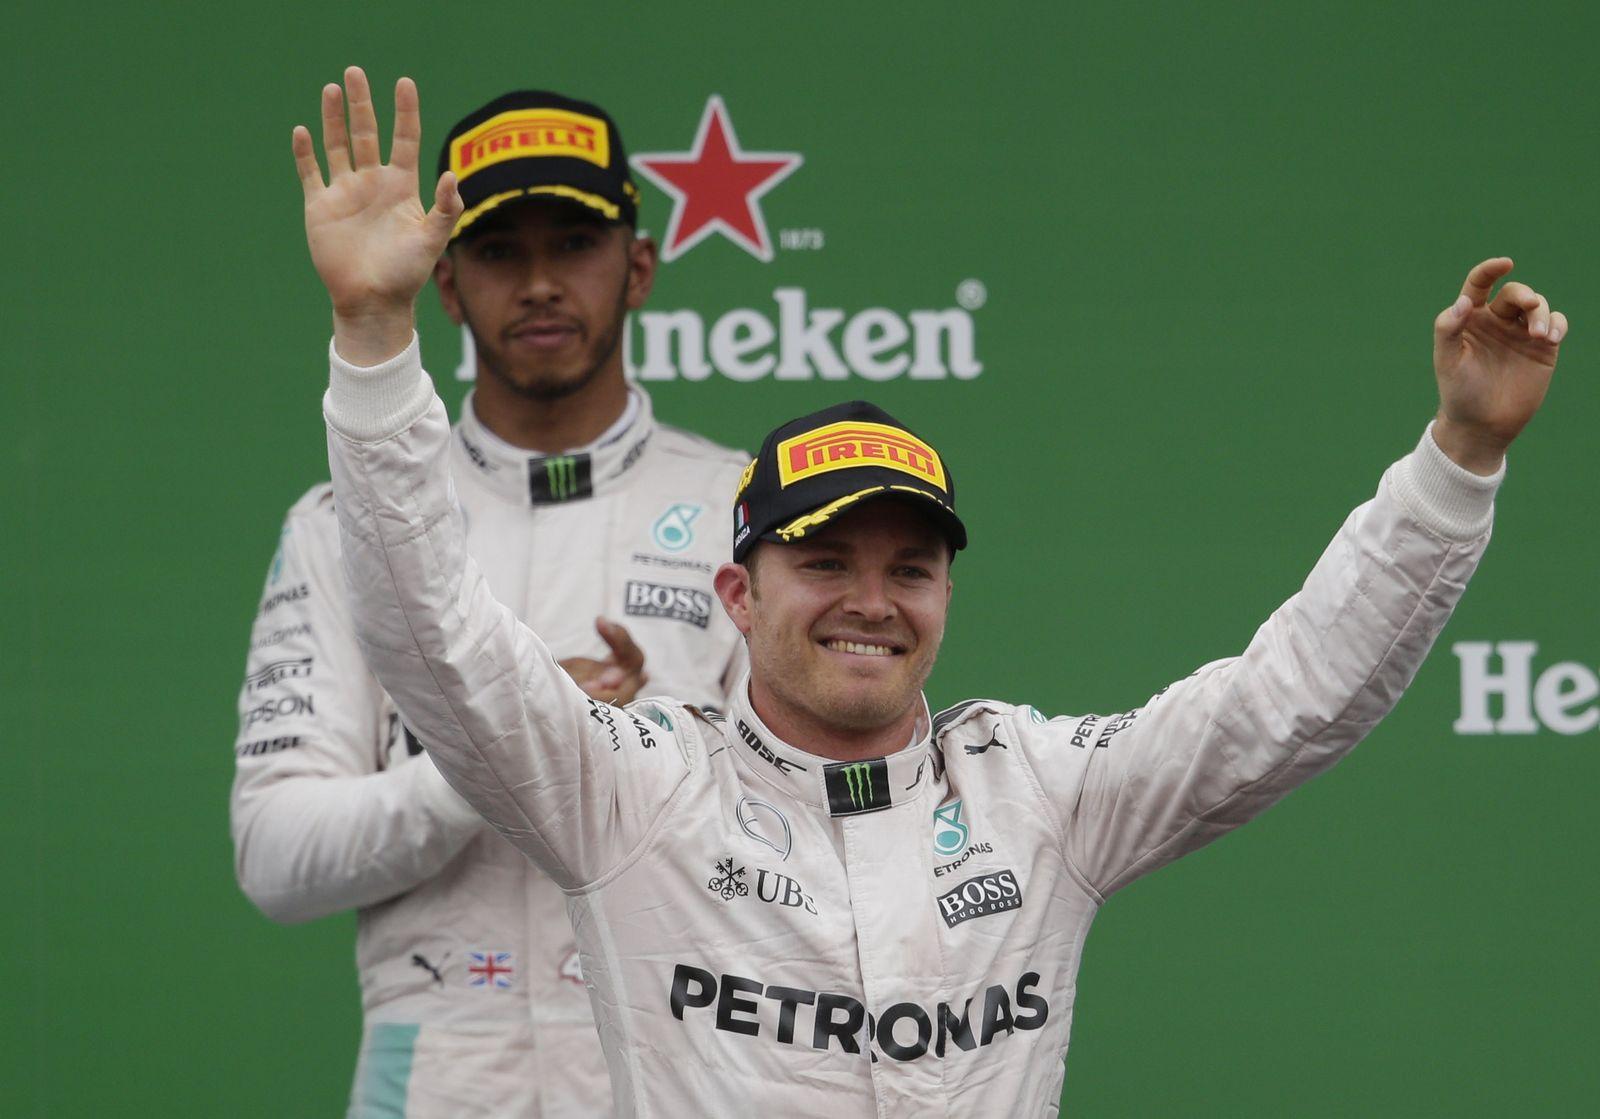 Monza Hamilton Rosberg